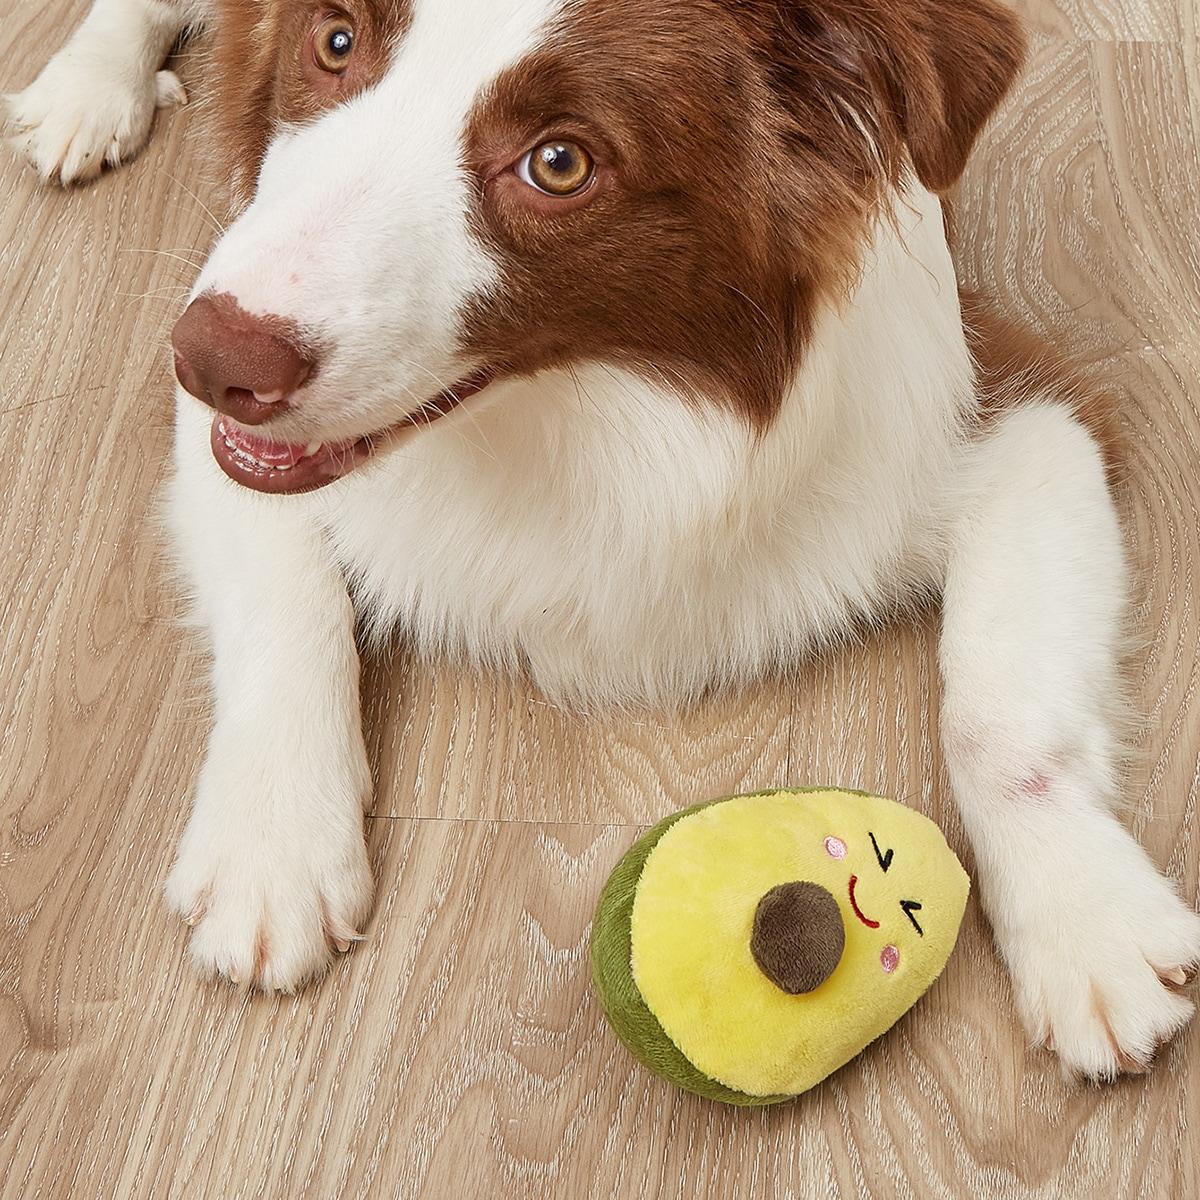 1 Stück Haustier Soundspielzeug mit Avocado Design